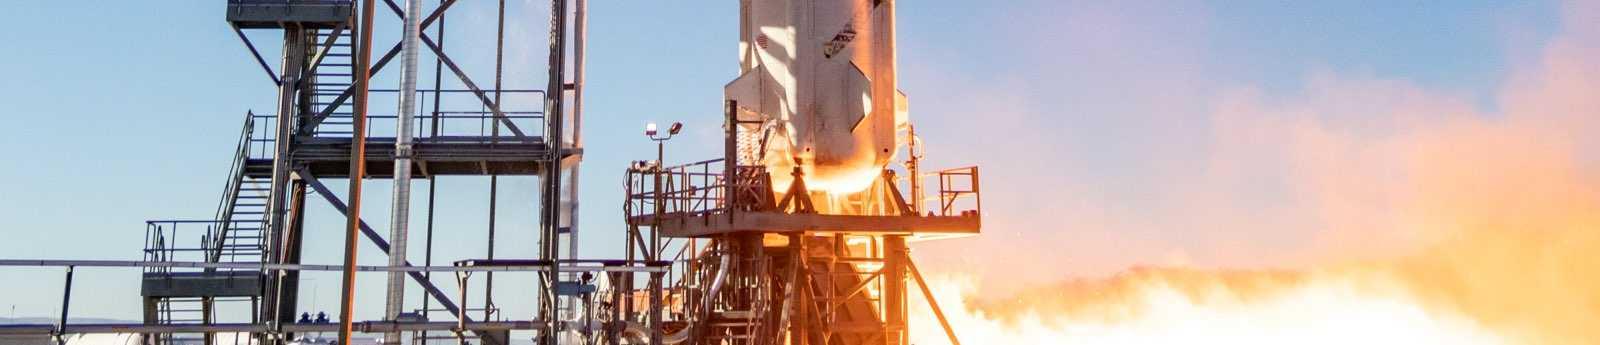 Press Release-SwRI tests liquid acquisition device aboard Blue Origin's New Shepherd rocket